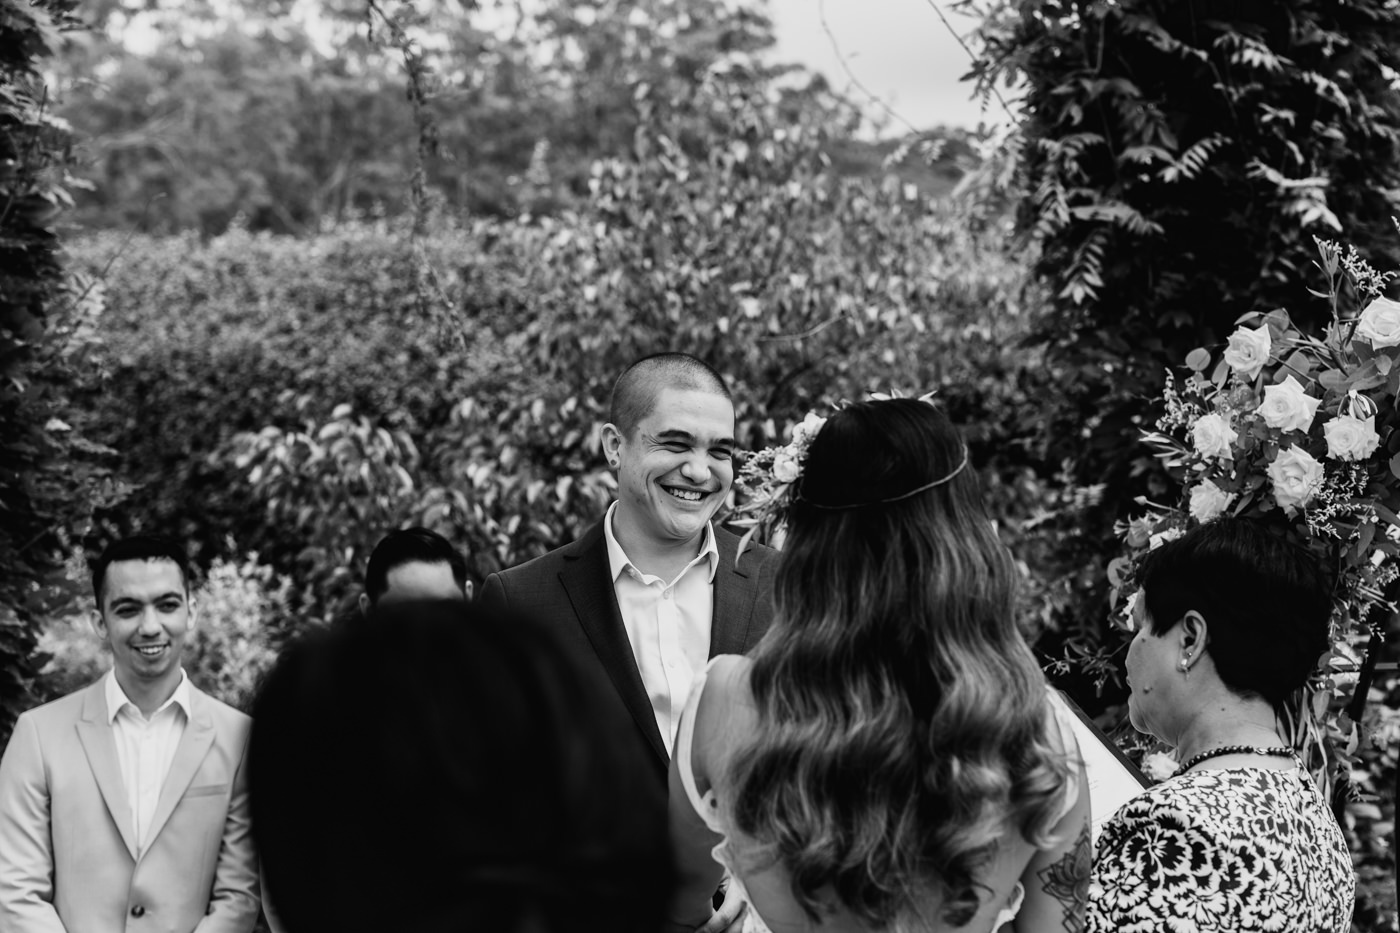 Nick & Vanezza - Fernbank Farm Wedding - Samantha Heather Photography-66.jpg